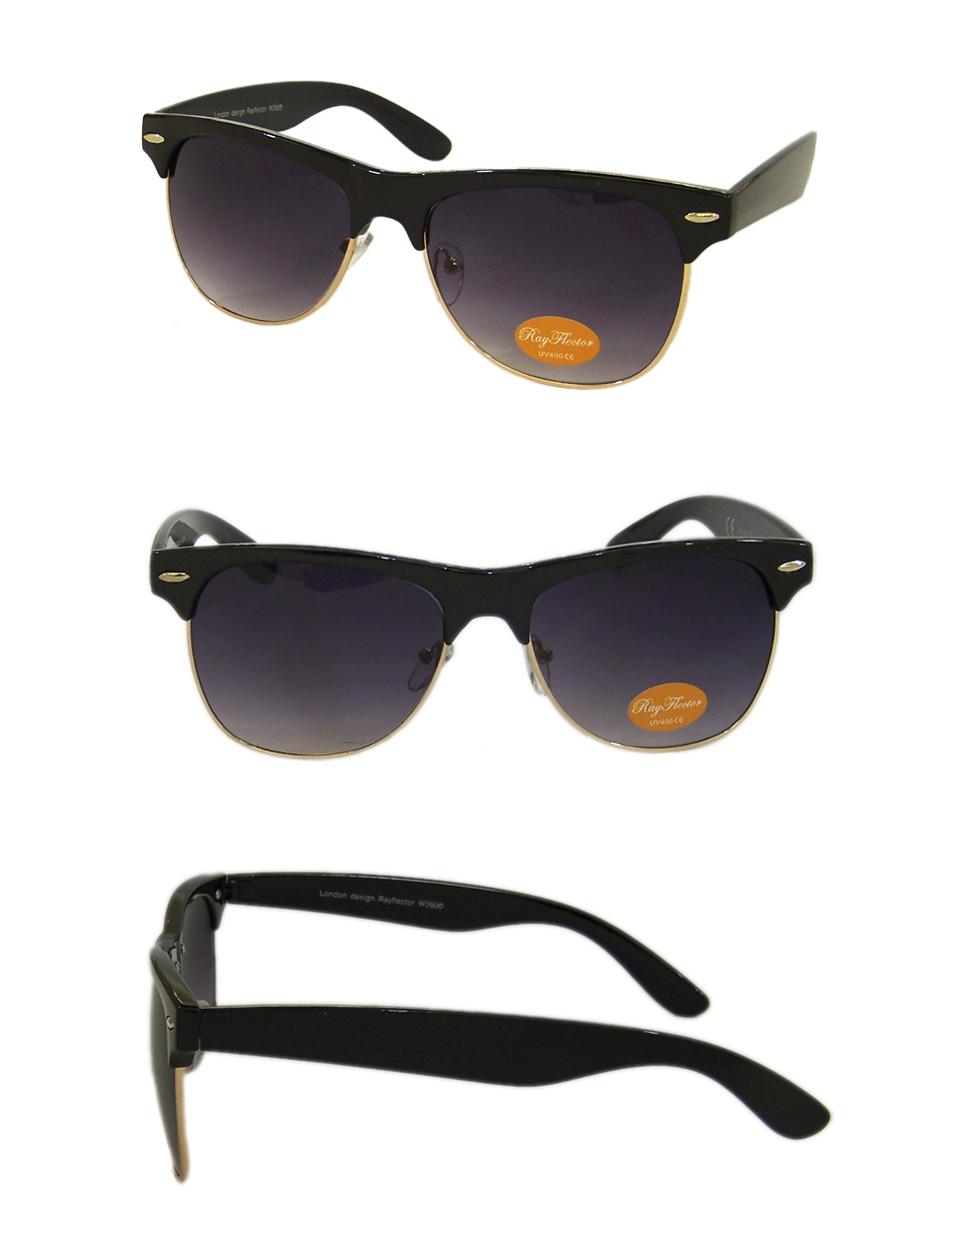 6a3b1ddf0ce Classic Modern Clubmaster Sunglasses